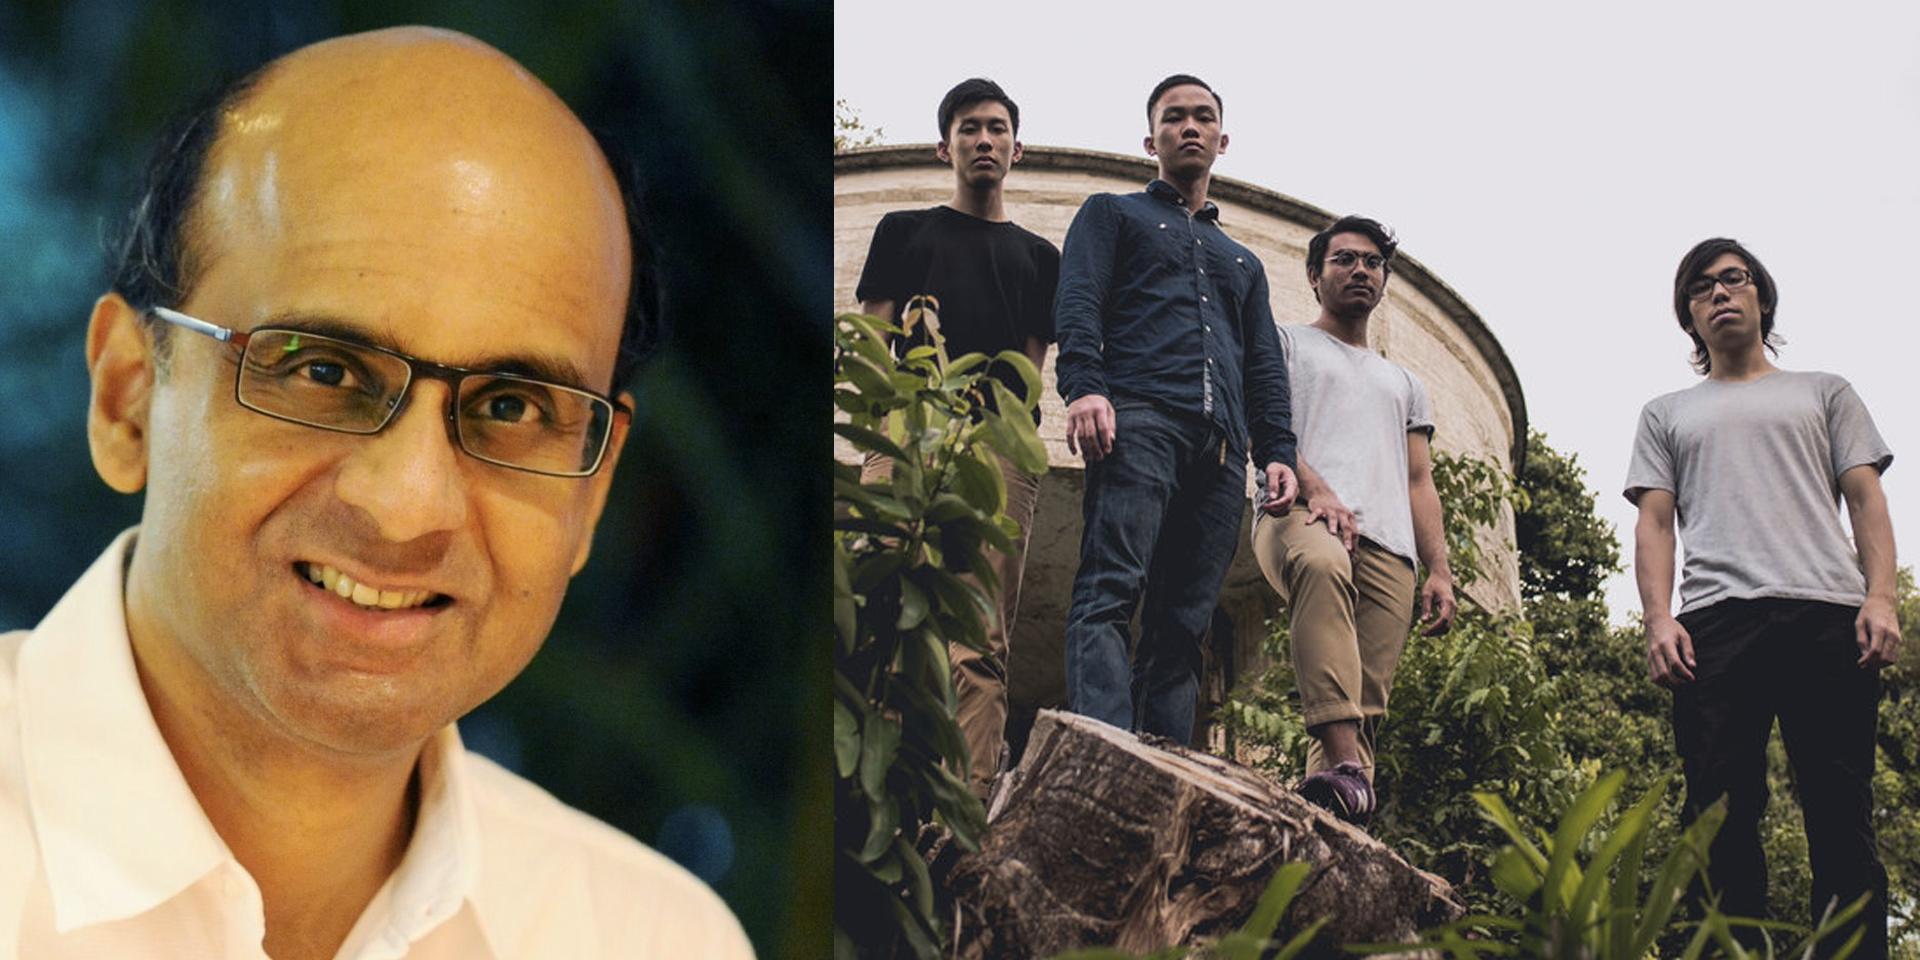 DPM Tharman Shanmugaratnam shouts out Gentle Bones, approves of Sphaeras